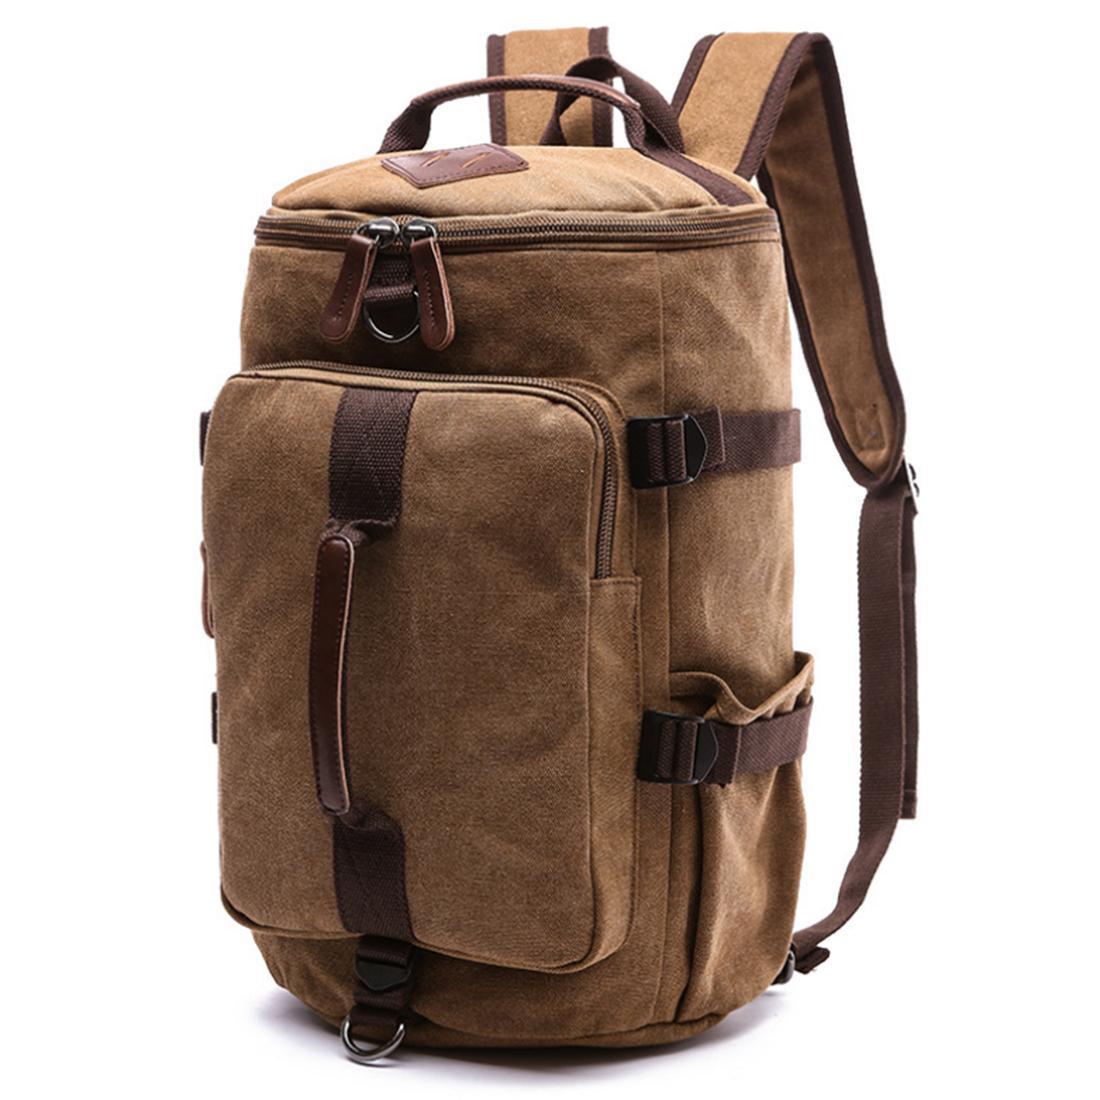 Fashion Big Capacity Canvas Handbag Travelling Single-shoulder Bag Round Backpack - Coffee S